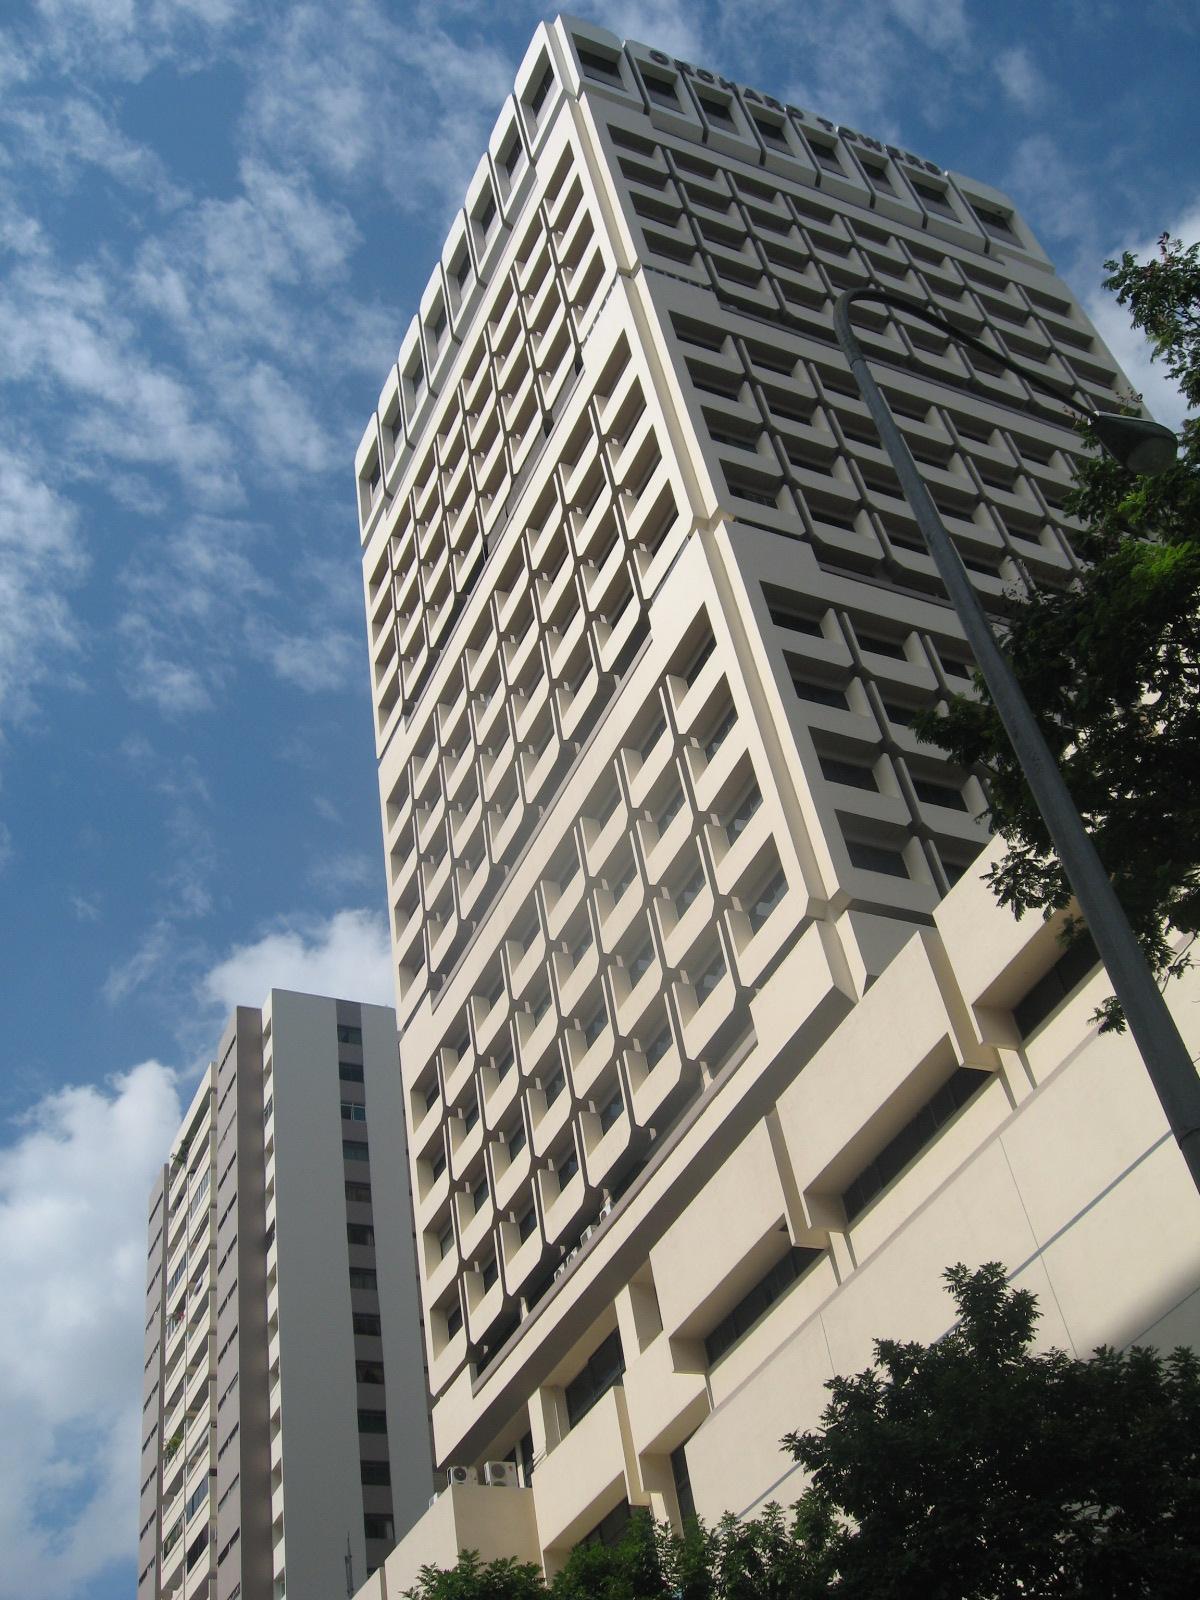 Orchard Towers - Wikipedia